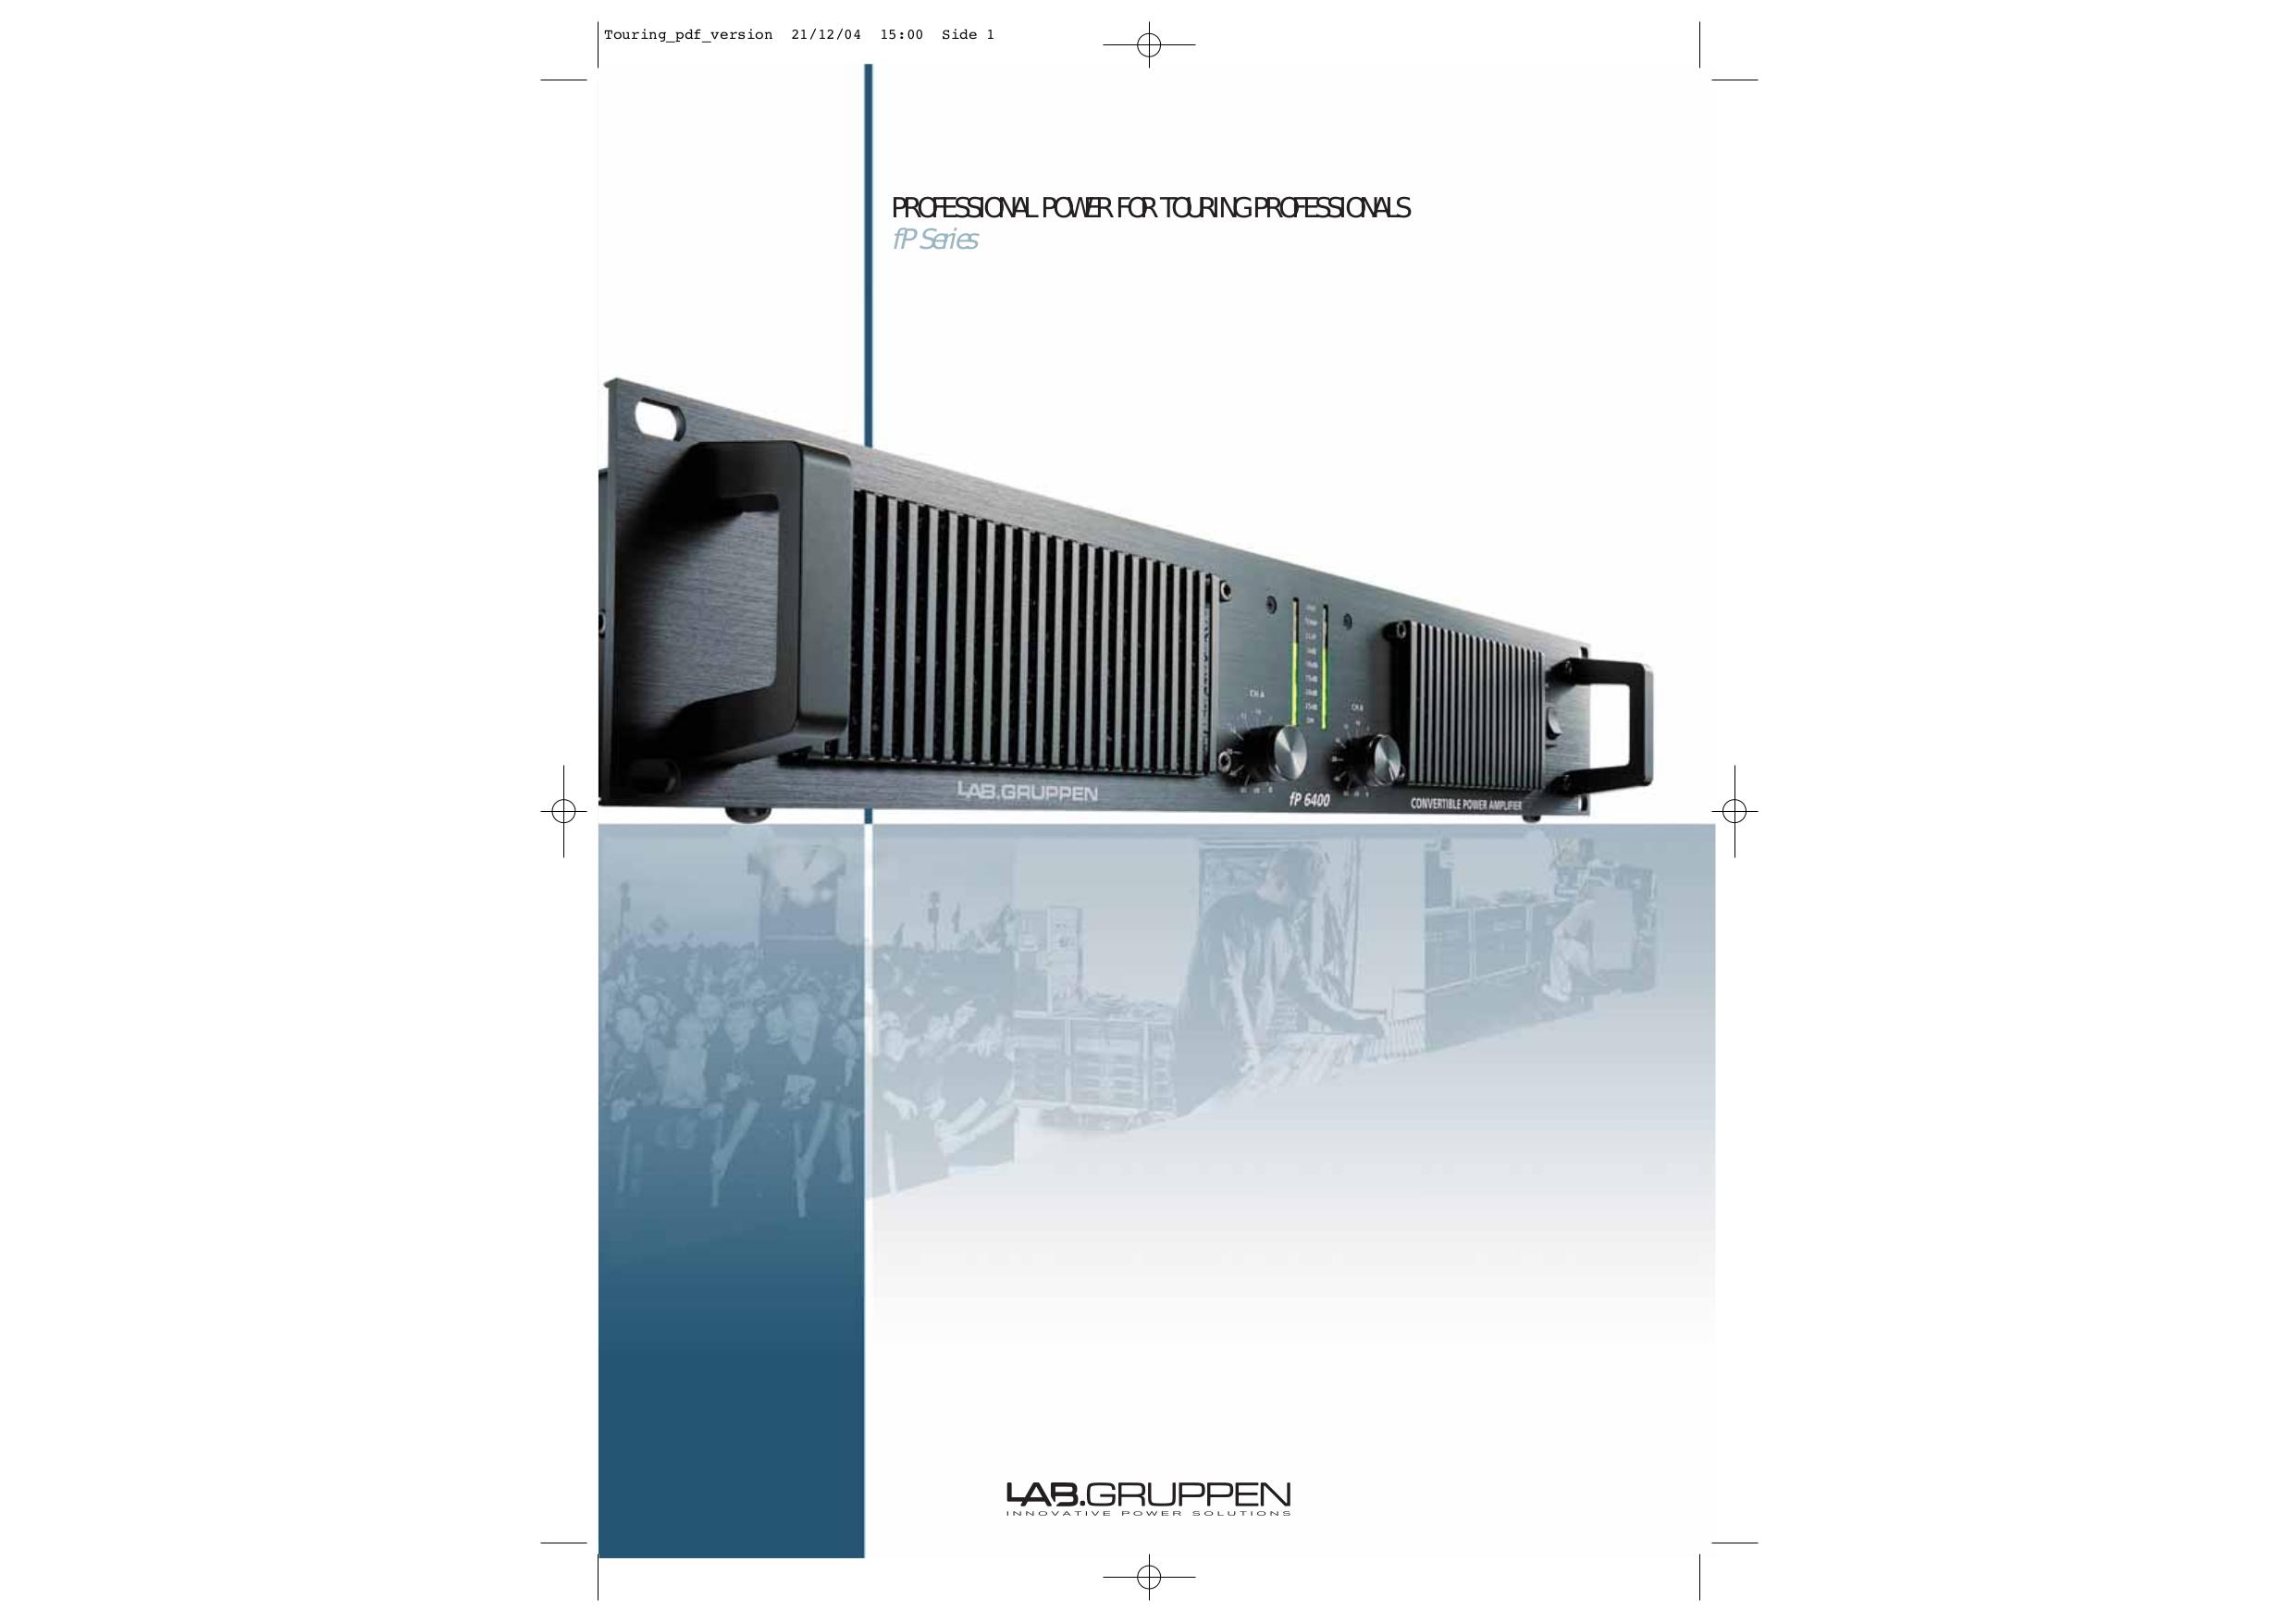 pdf for Lab.gruppen Amp fP Series FP 3400 manual